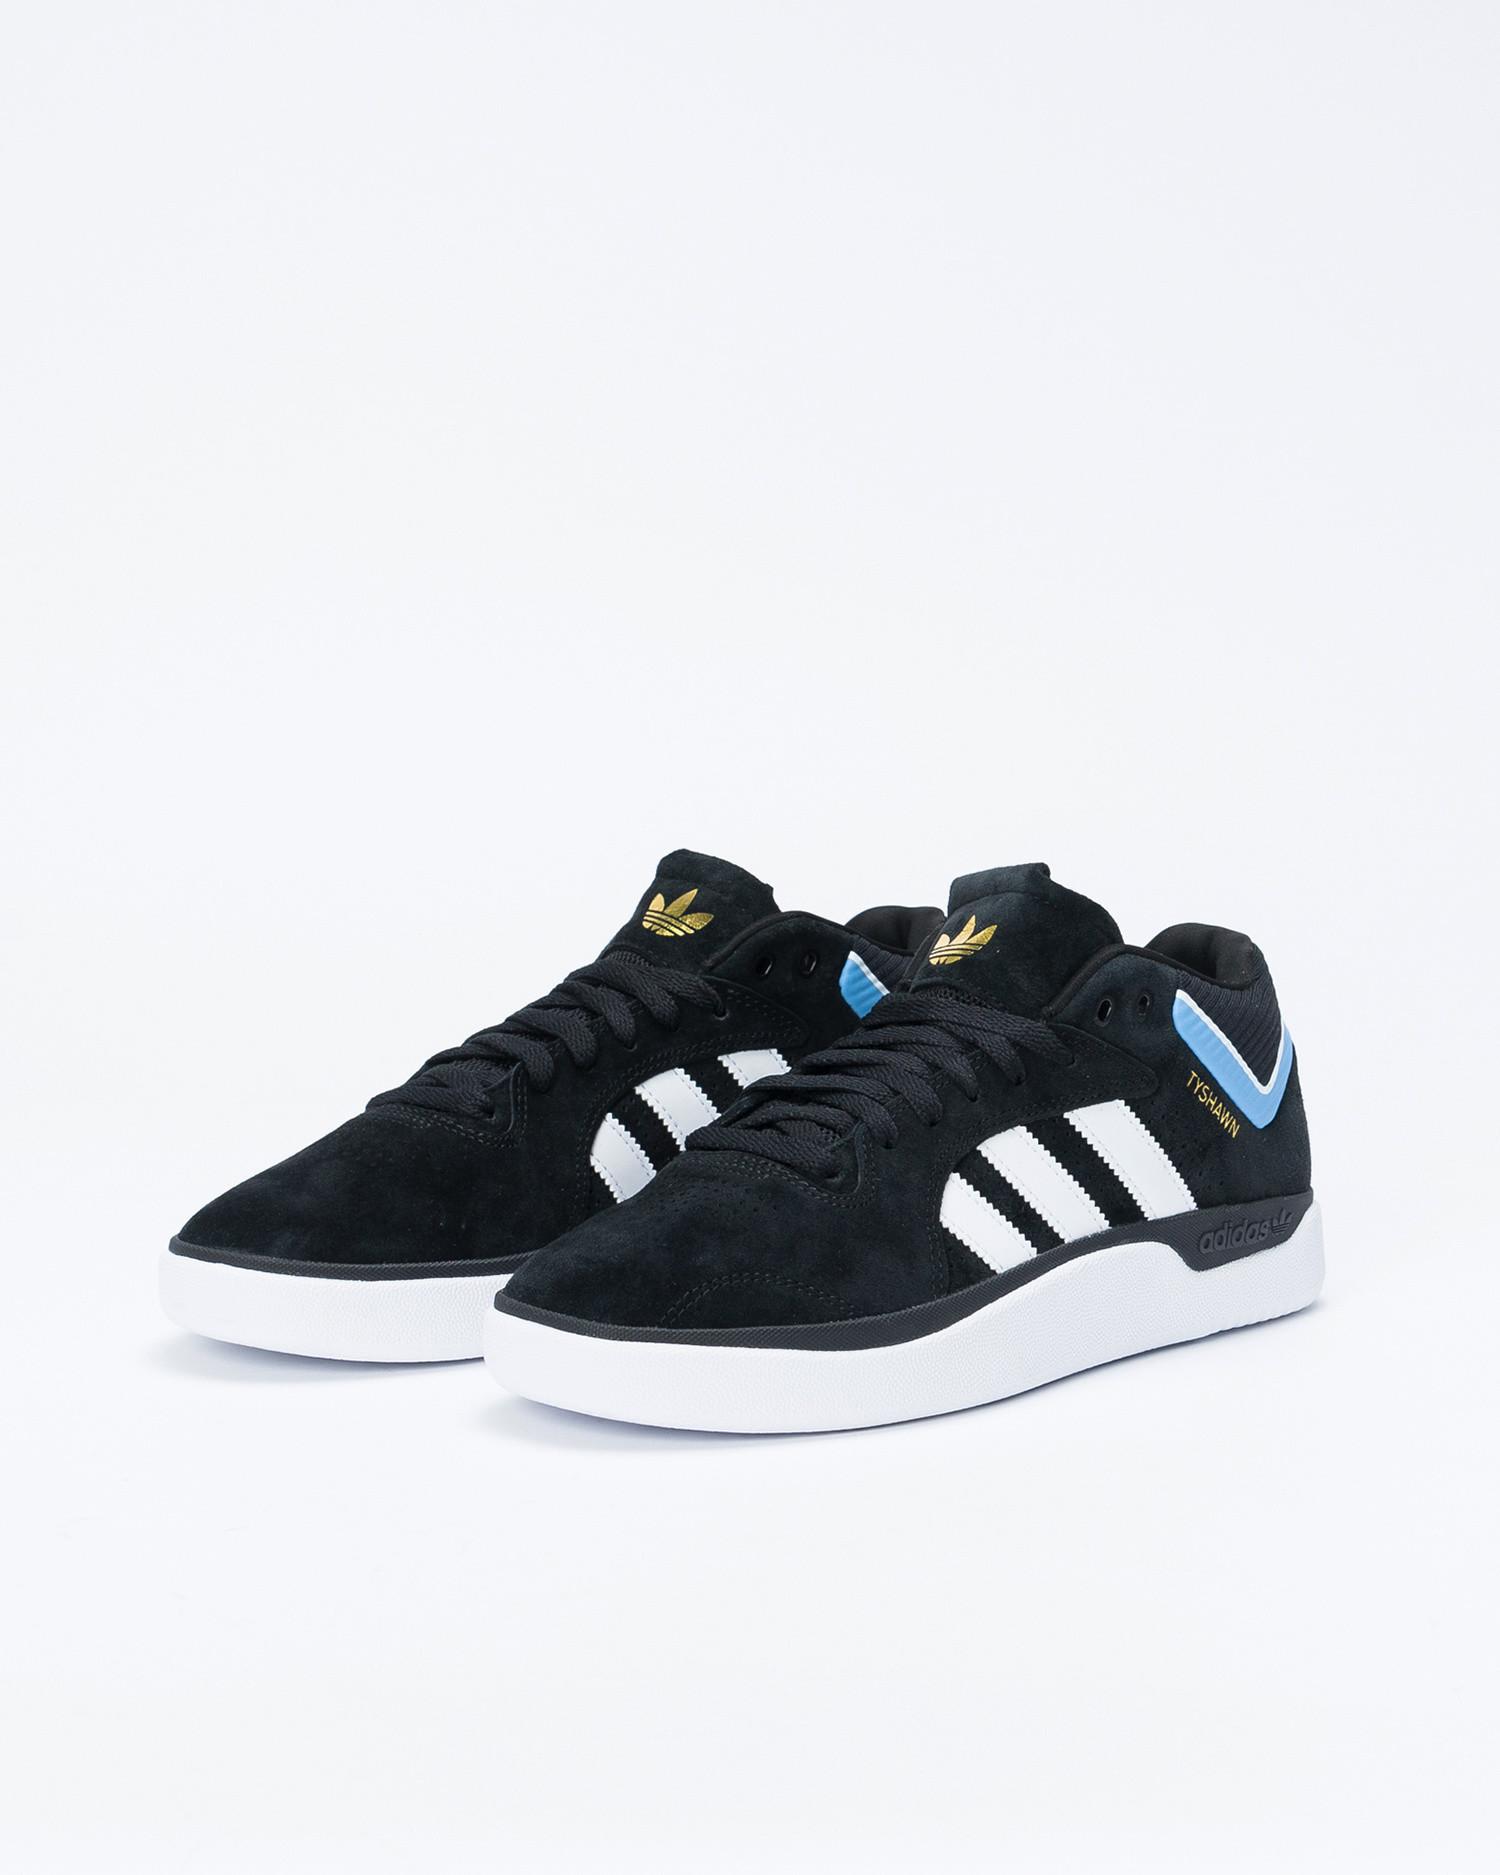 Adidas Tyshawn Core Black/Footwear White/Light Blue